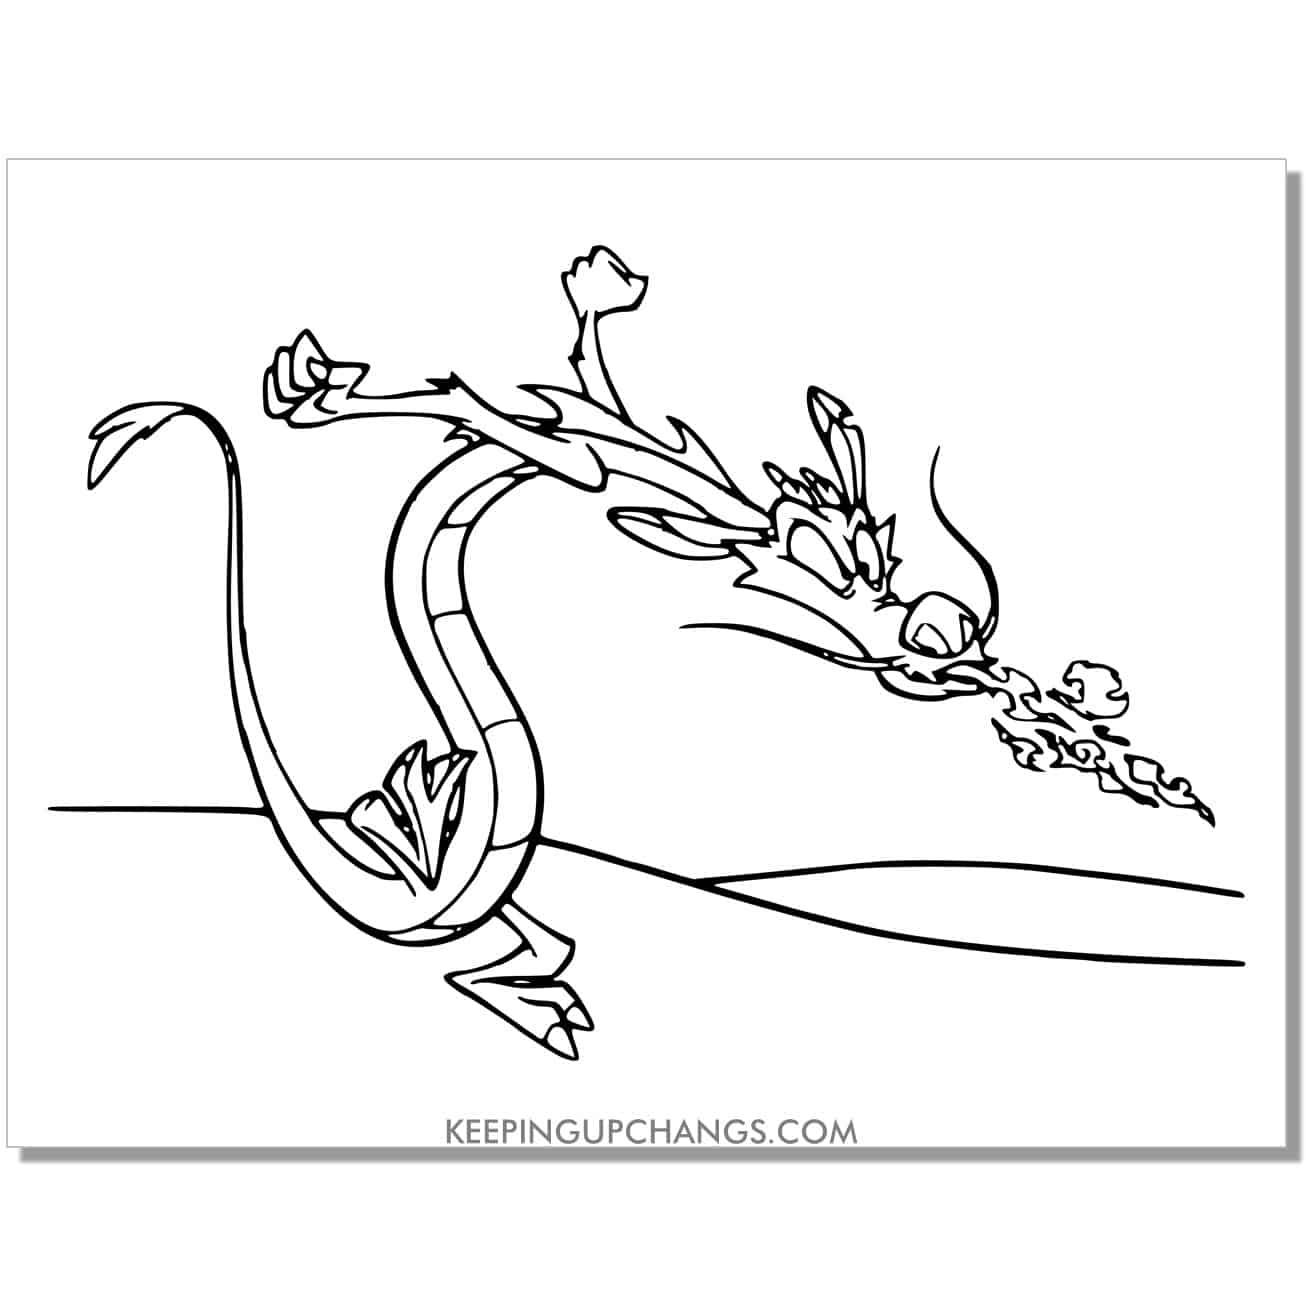 mulan mushu dragon breathing fire coloring page.